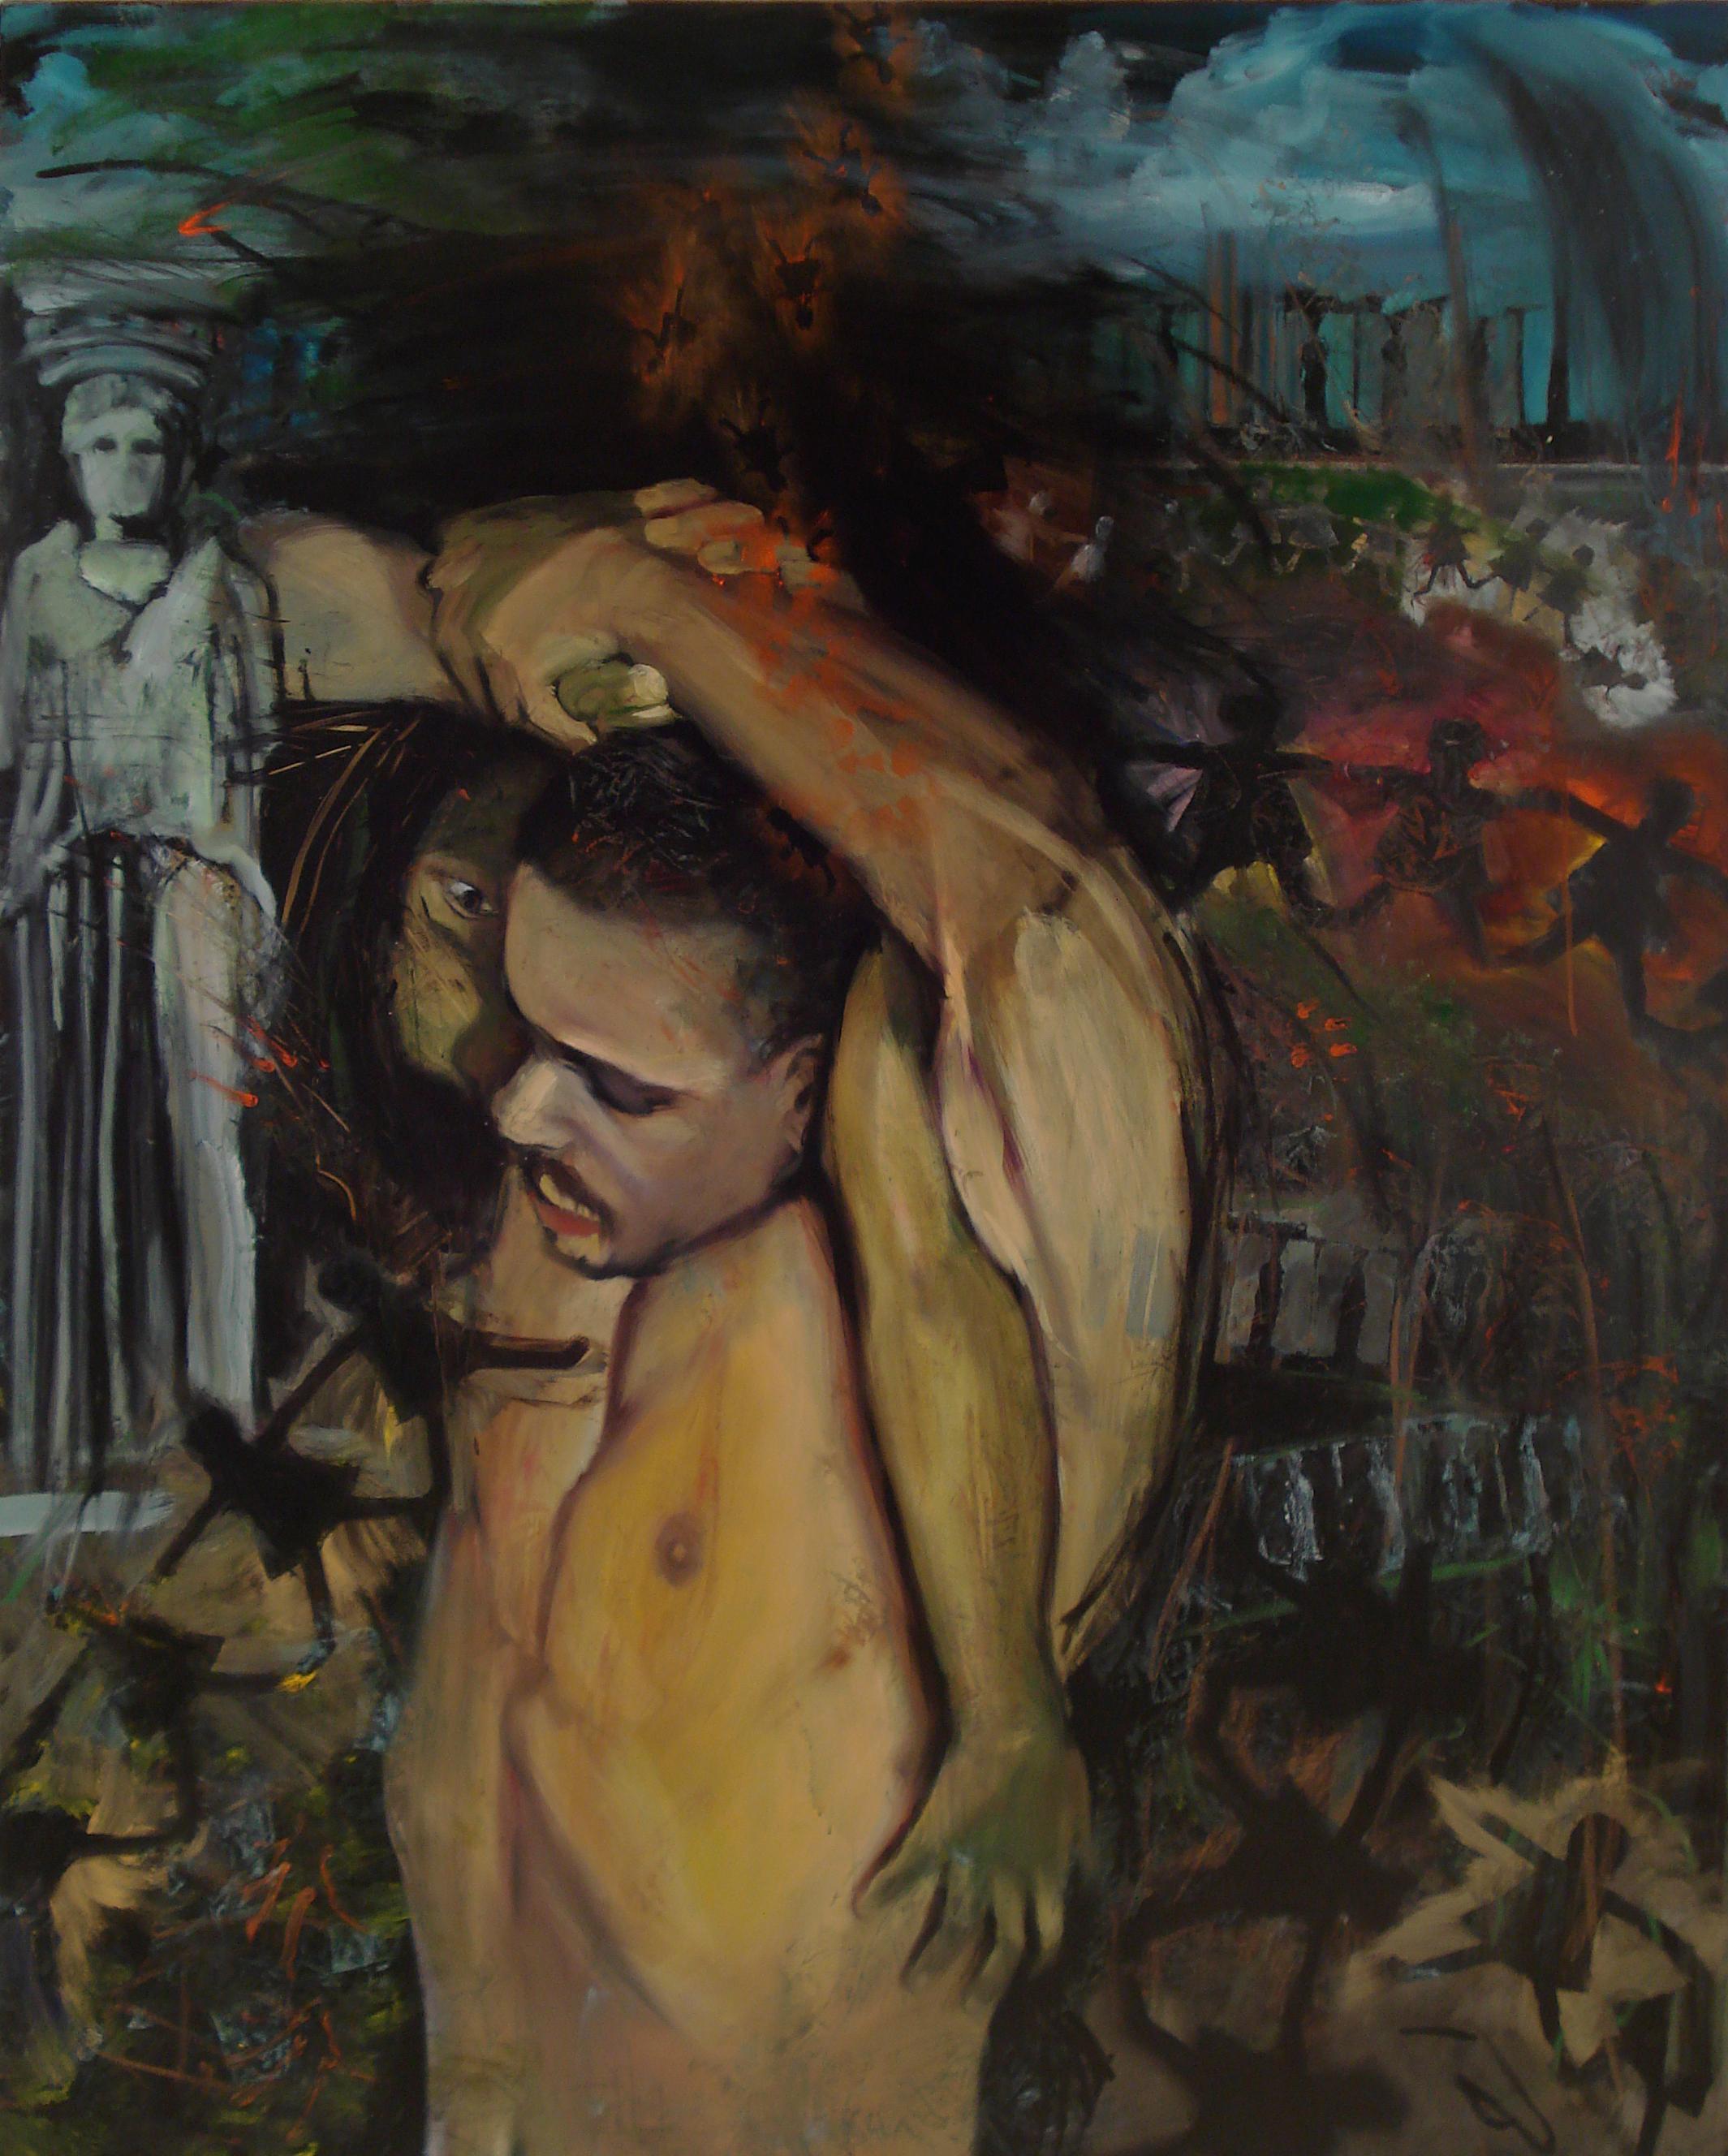 History and Innocence, symbolic interpretation and social commentary